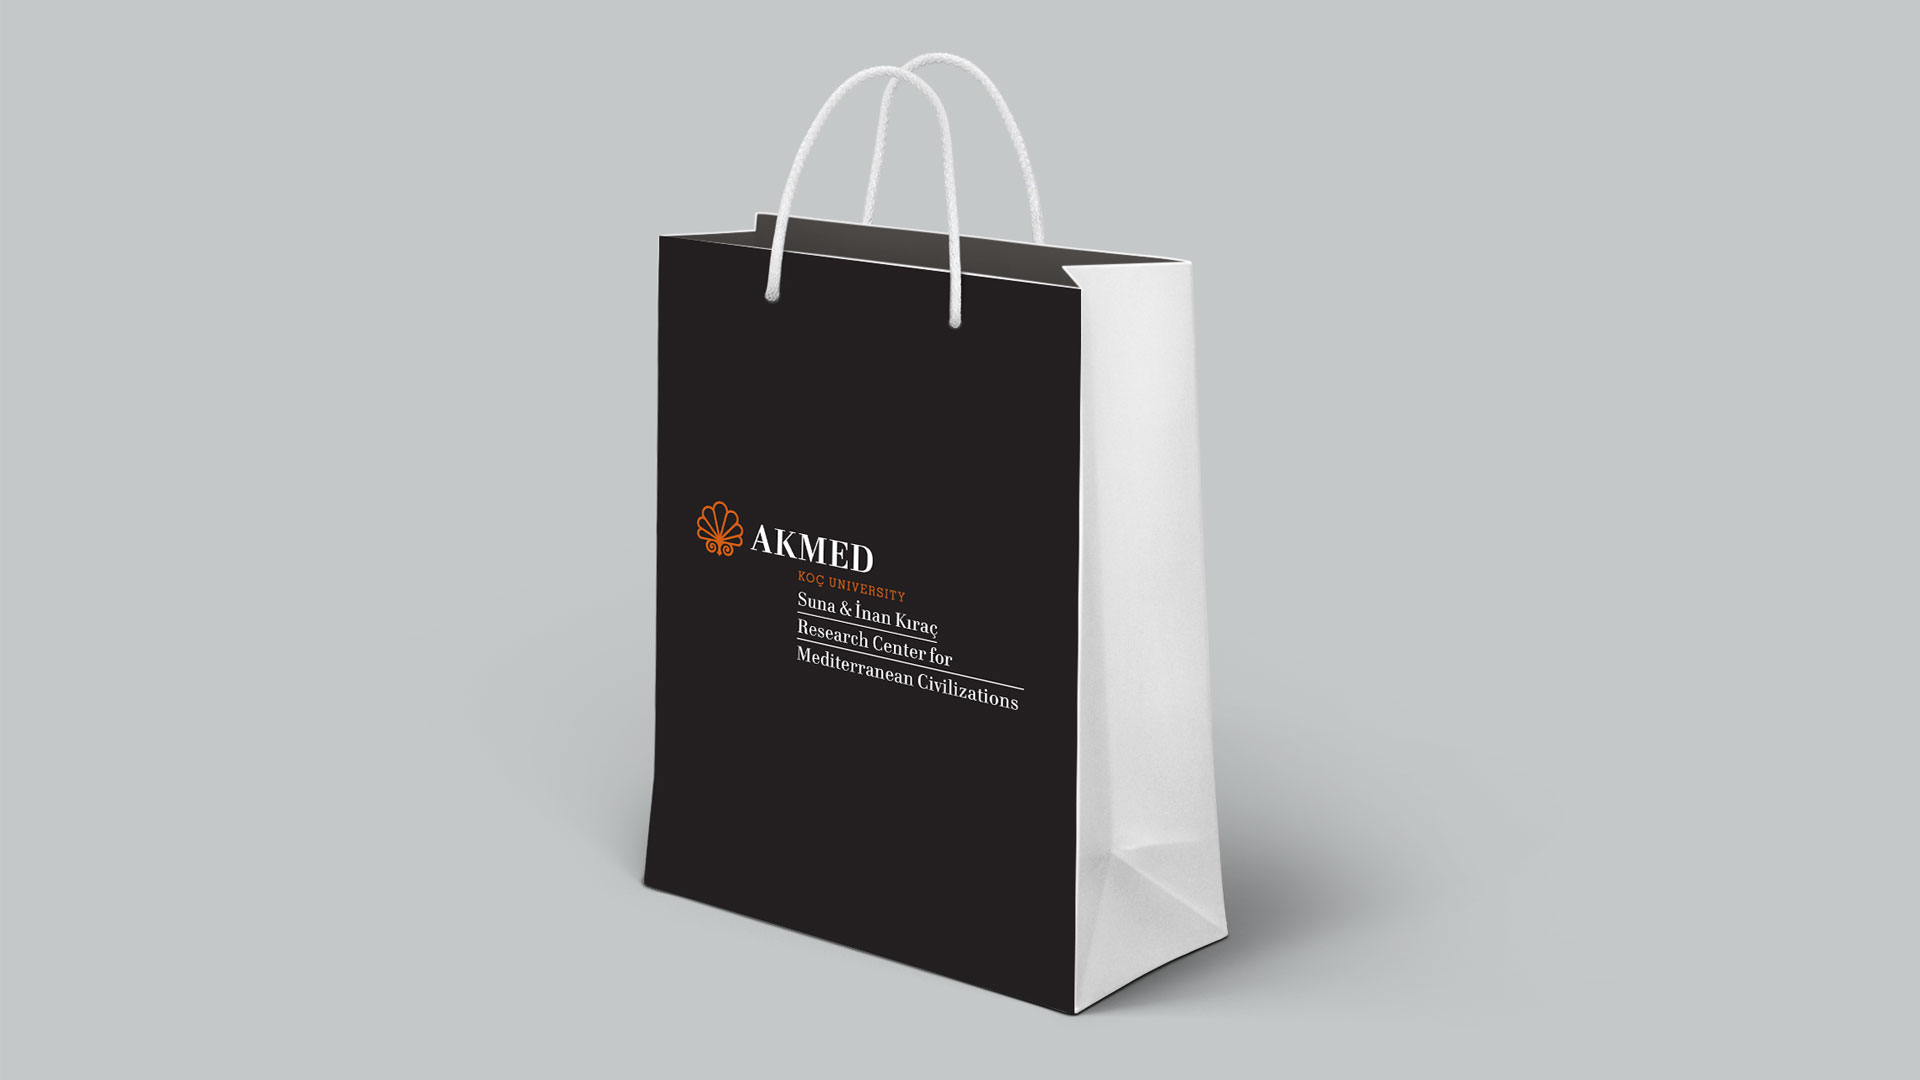 Akmed